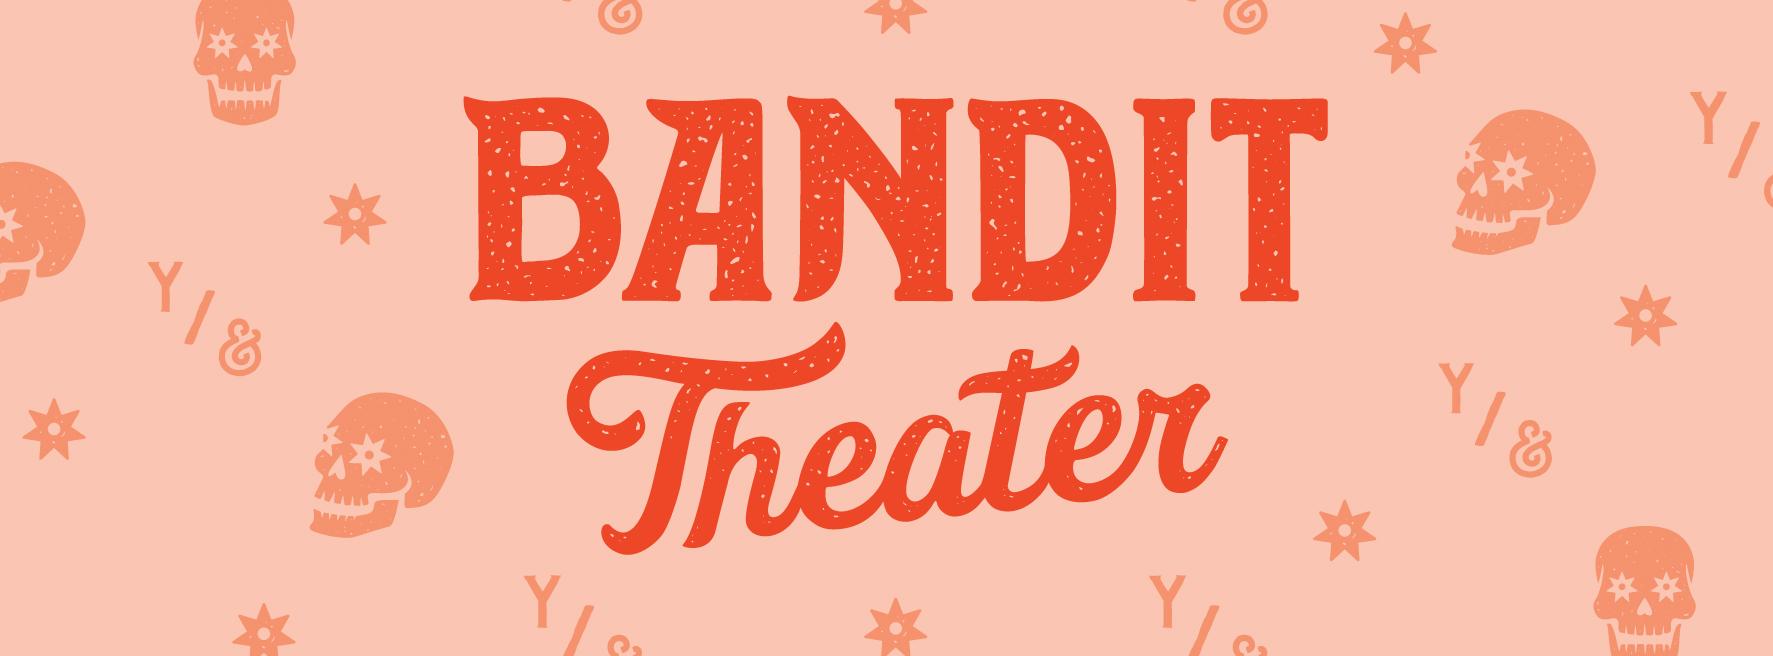 Bandit Theater